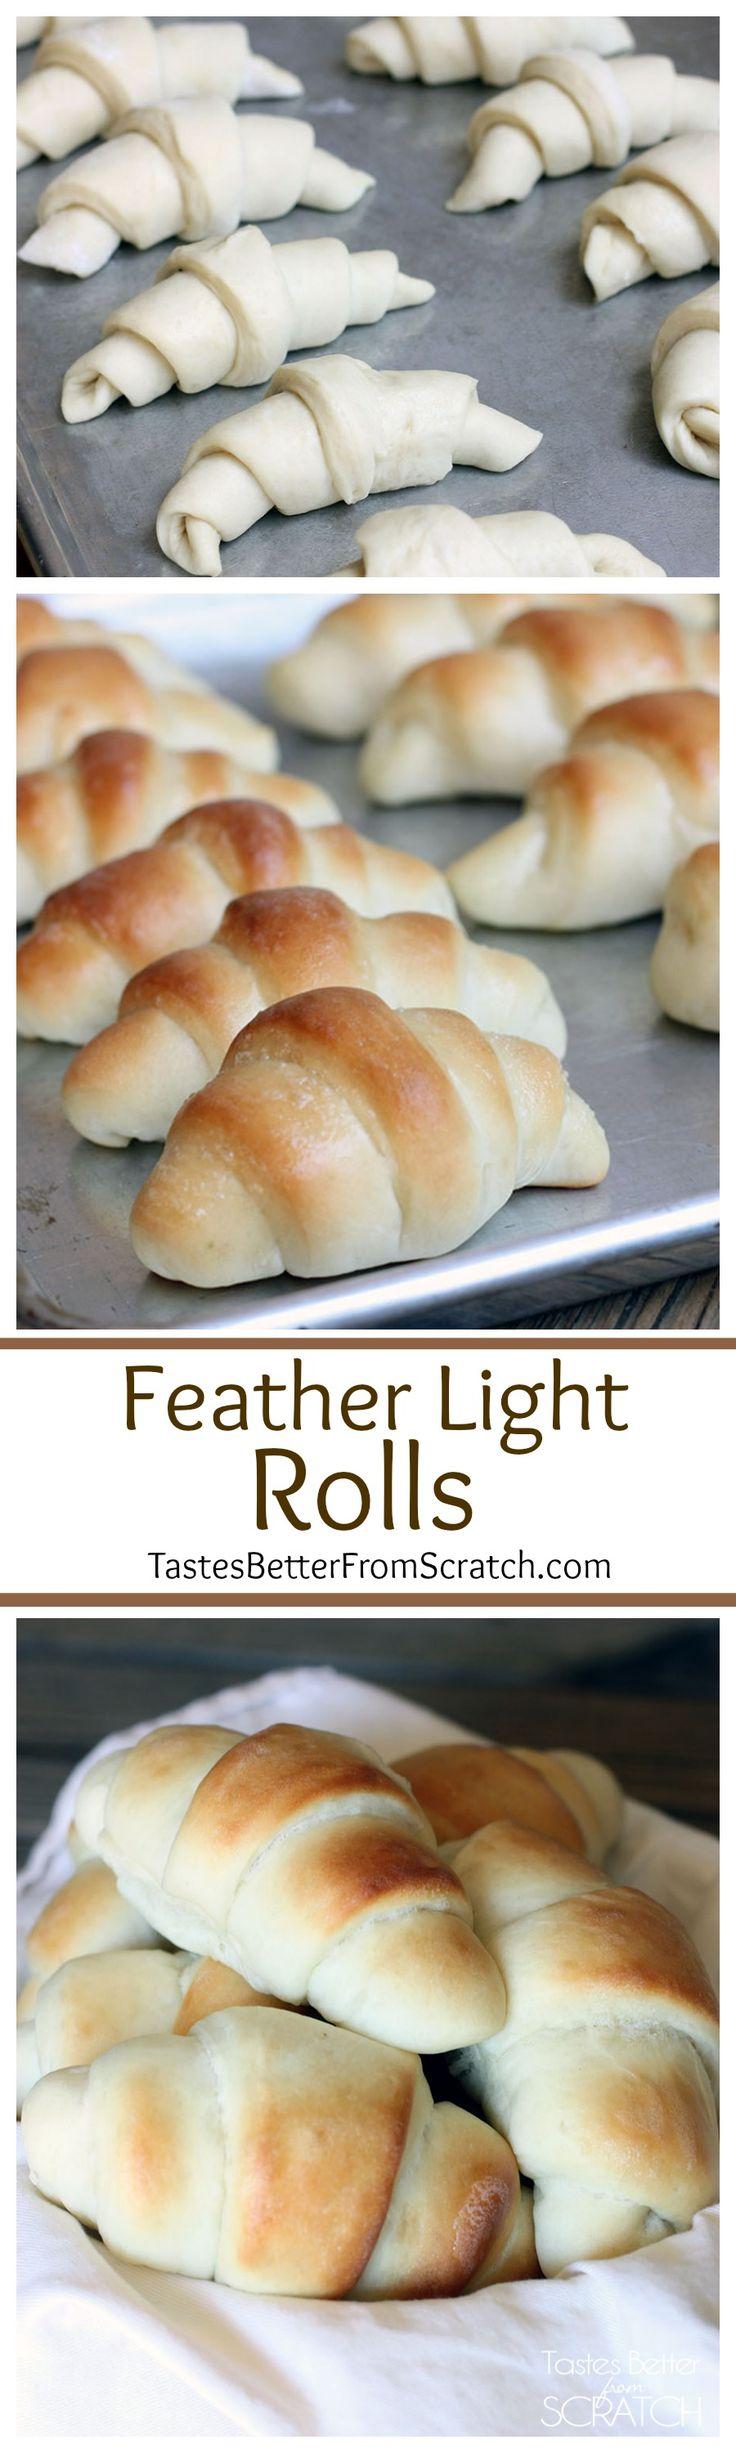 Feather Light Rolls | Recipe